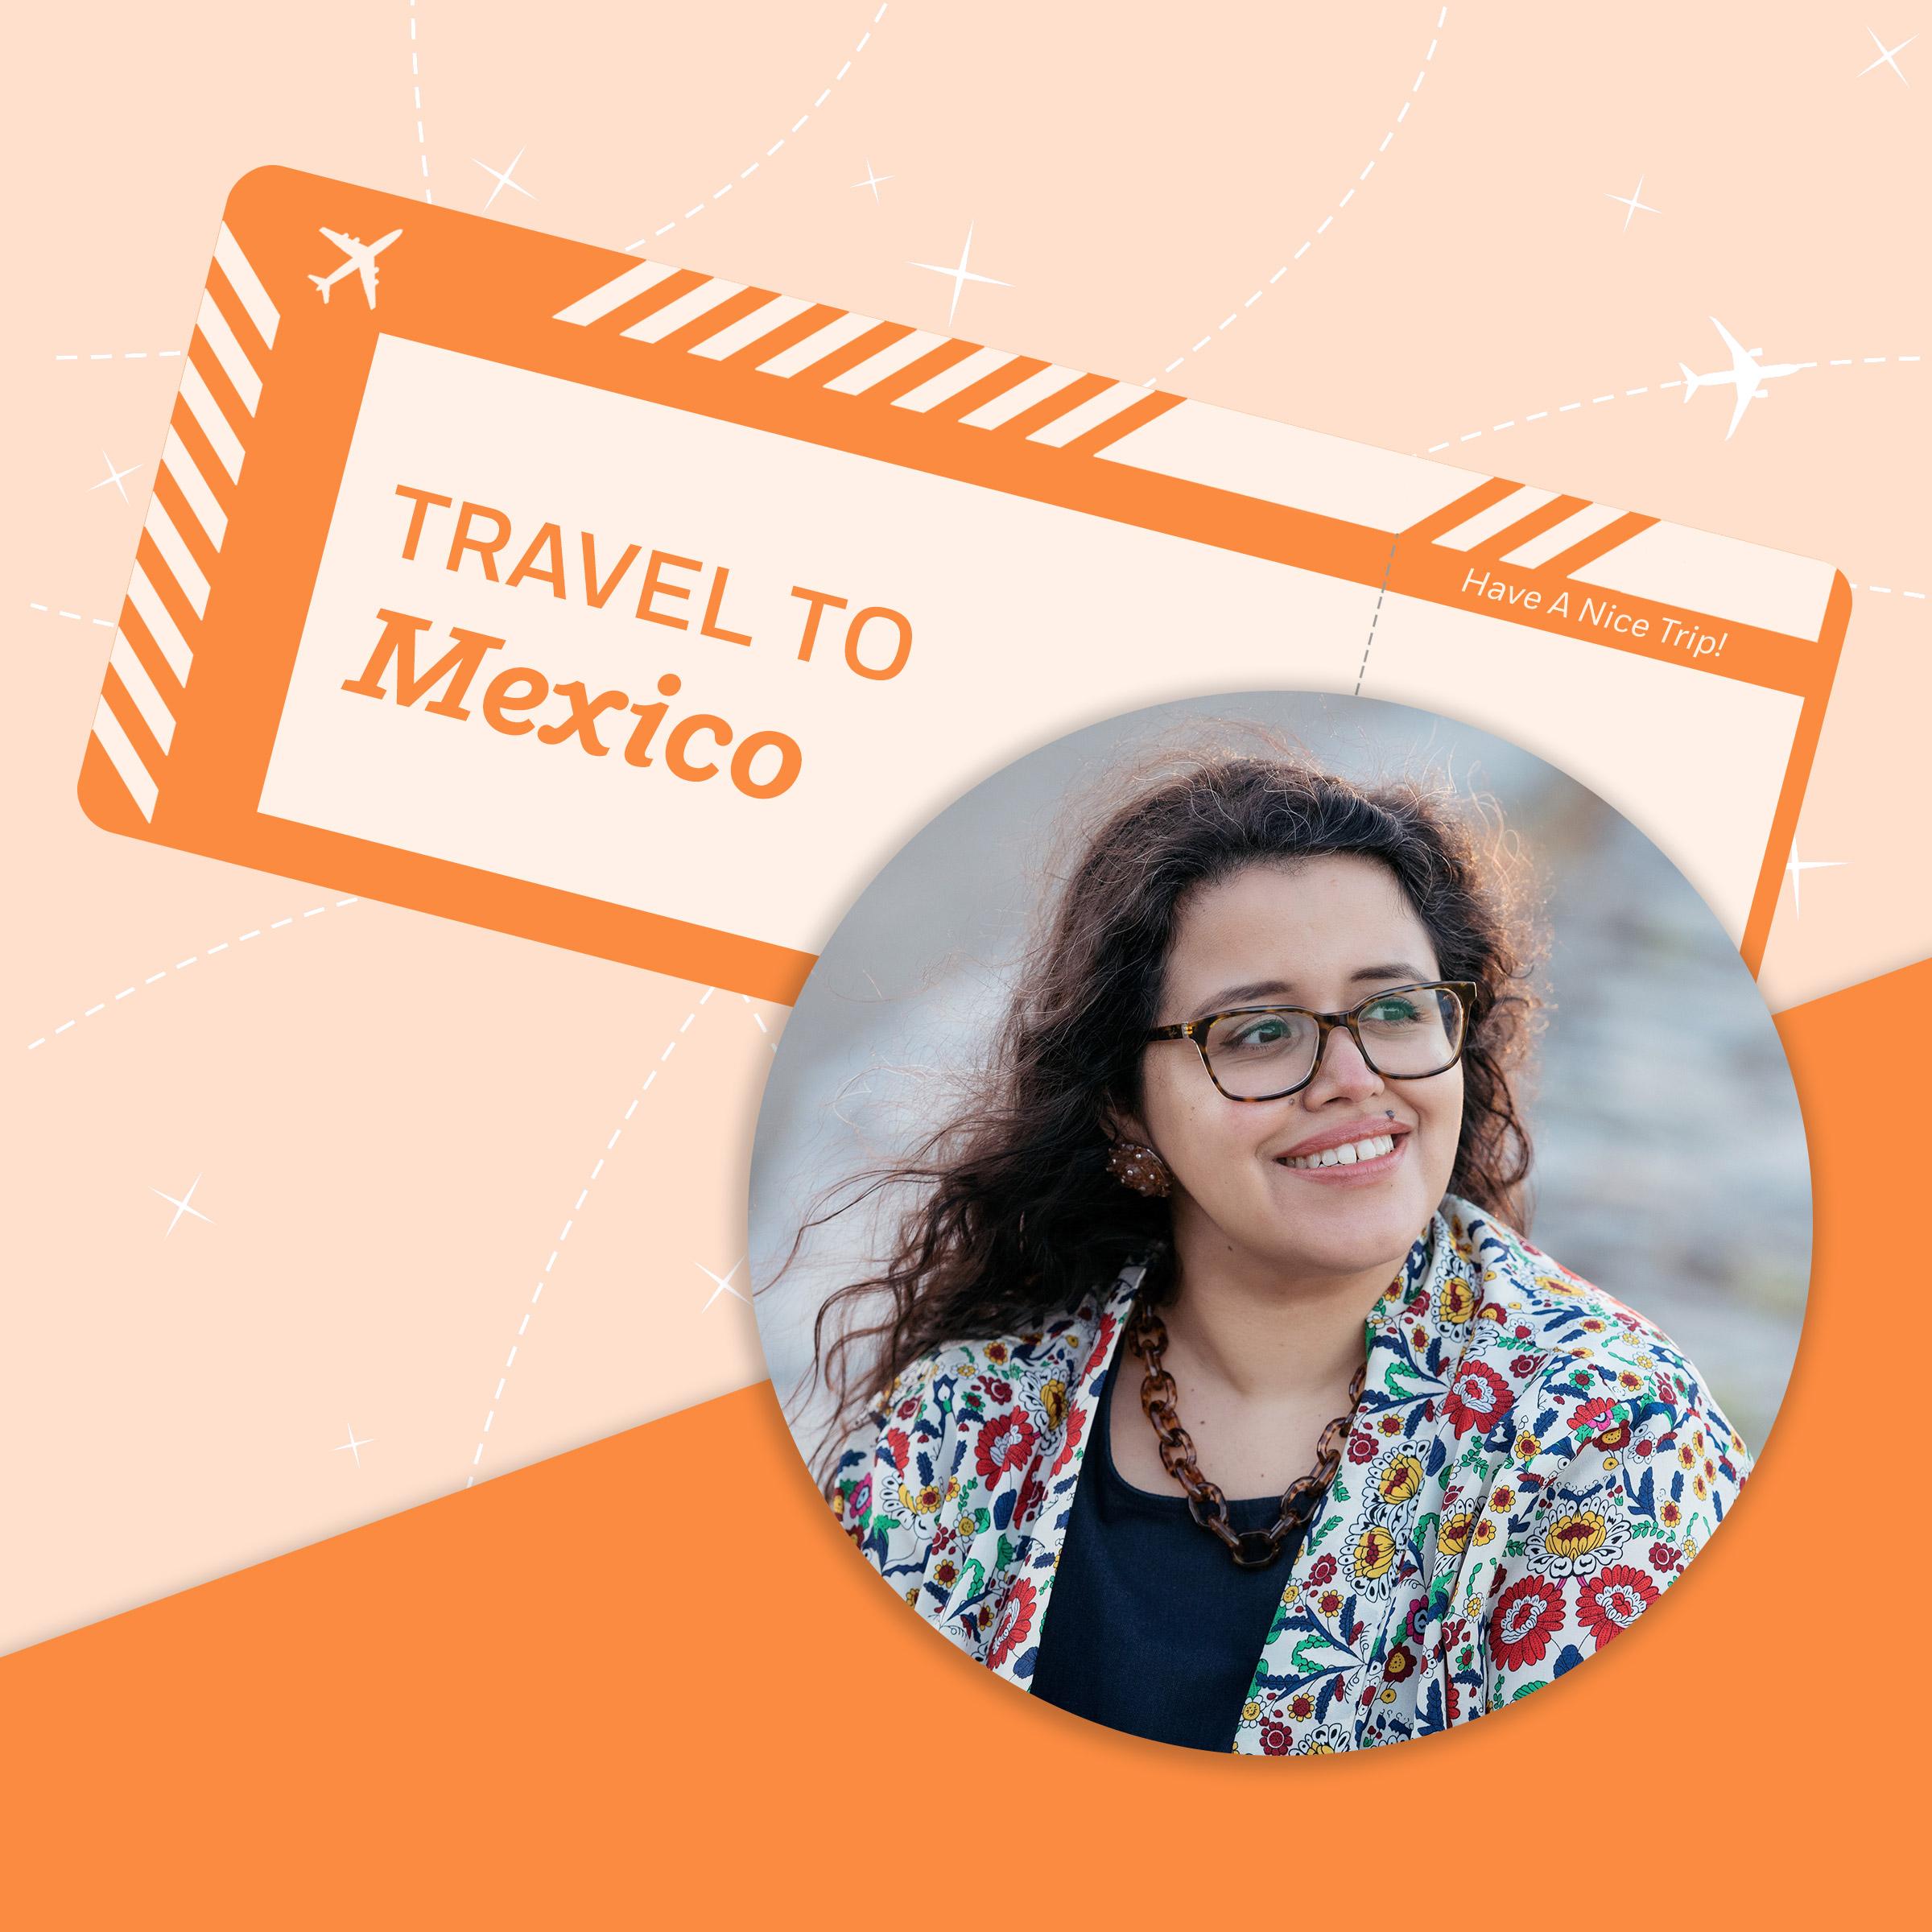 Travel to Mexico with Silvia Moreno-Garcia